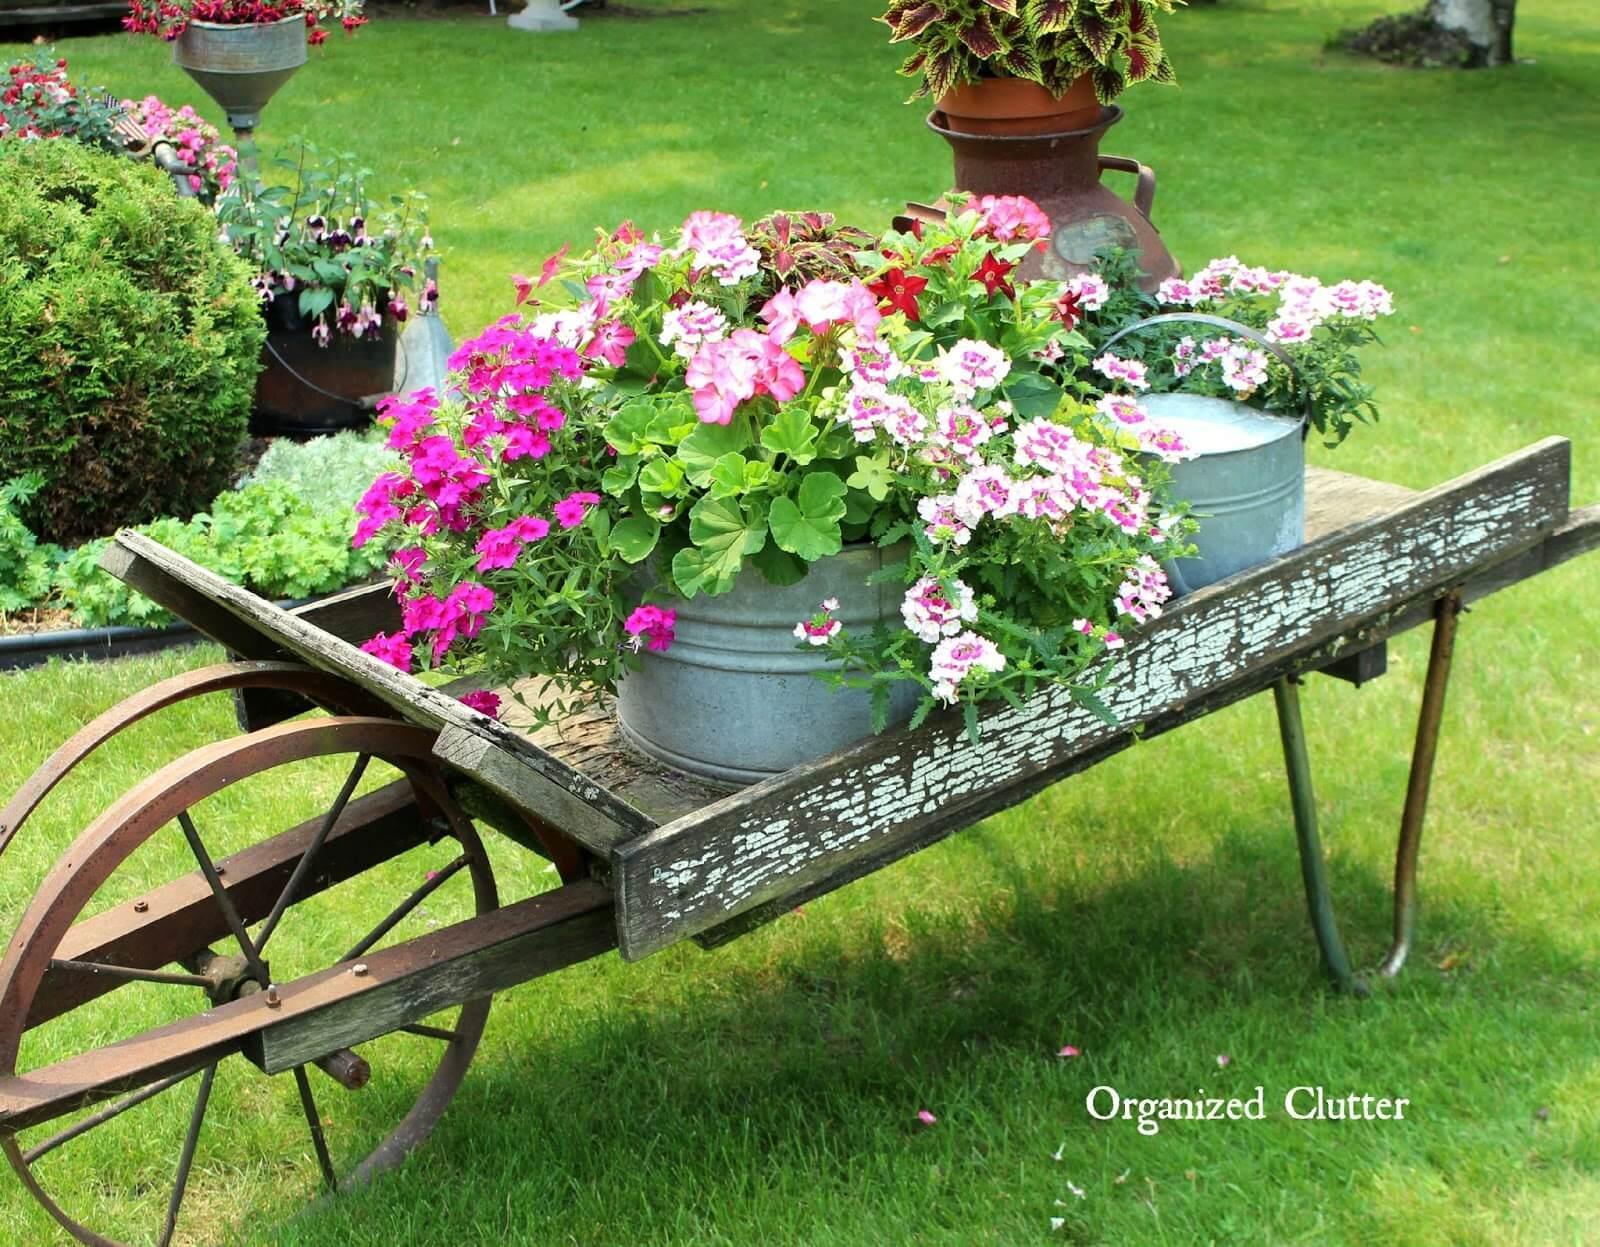 Wheelbarrow with Blooming Planters